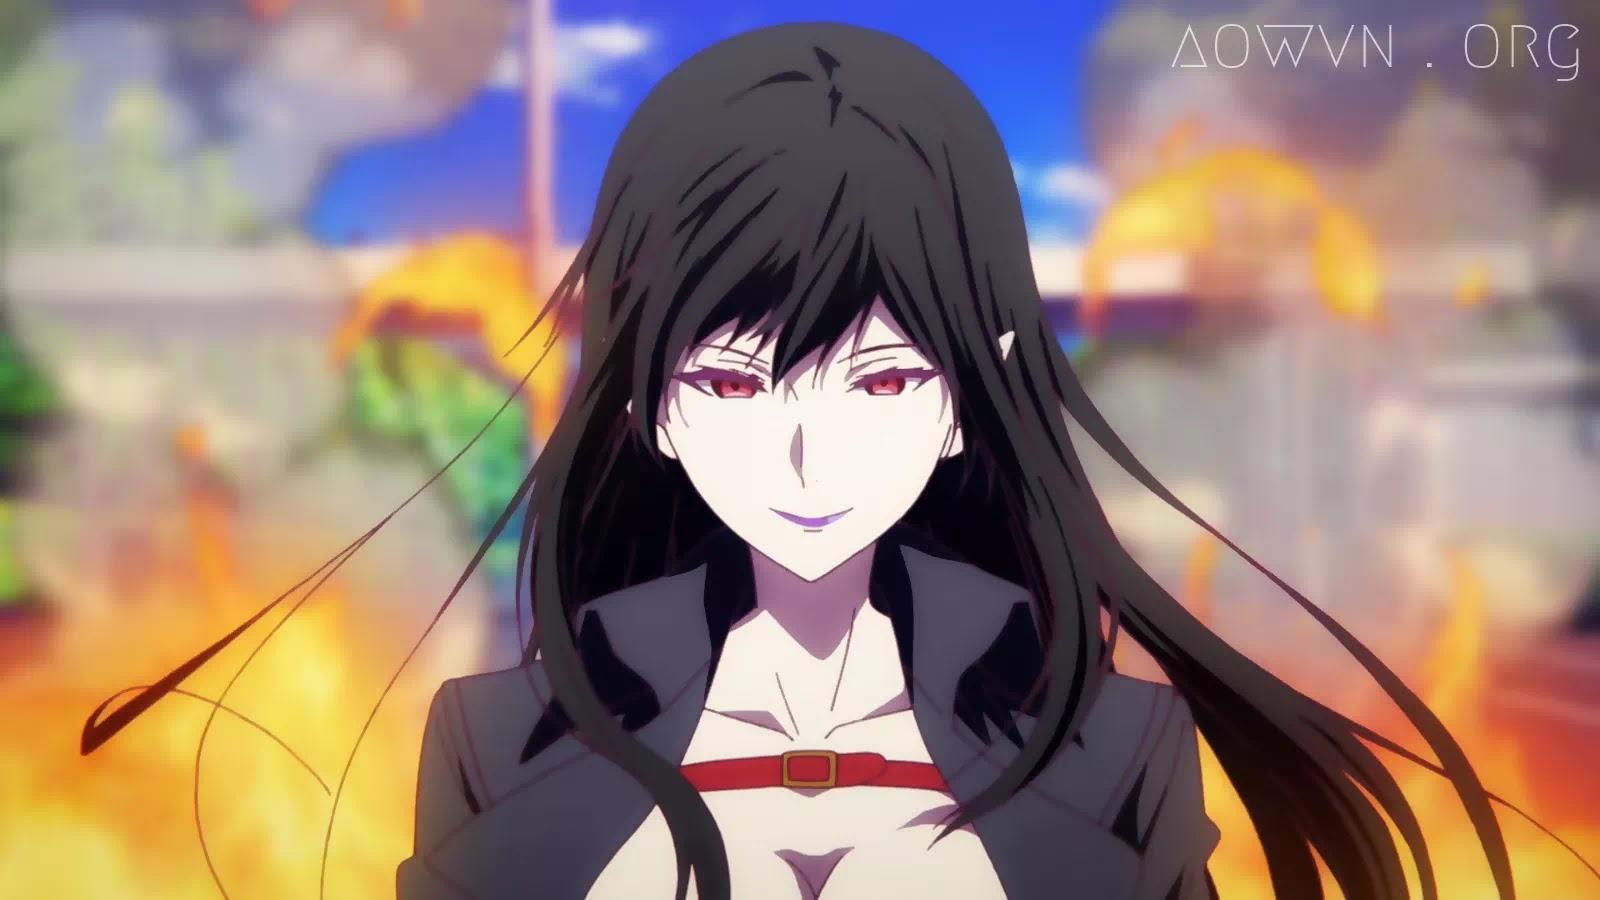 AowVN.org min%2B%25283%2529 - [ Anime 3gp Mp4 ] Musaigen no Phantom World + OVA BD | Vietsub - Ecchi Harem Art Cực Đẹp + Tặng Poster